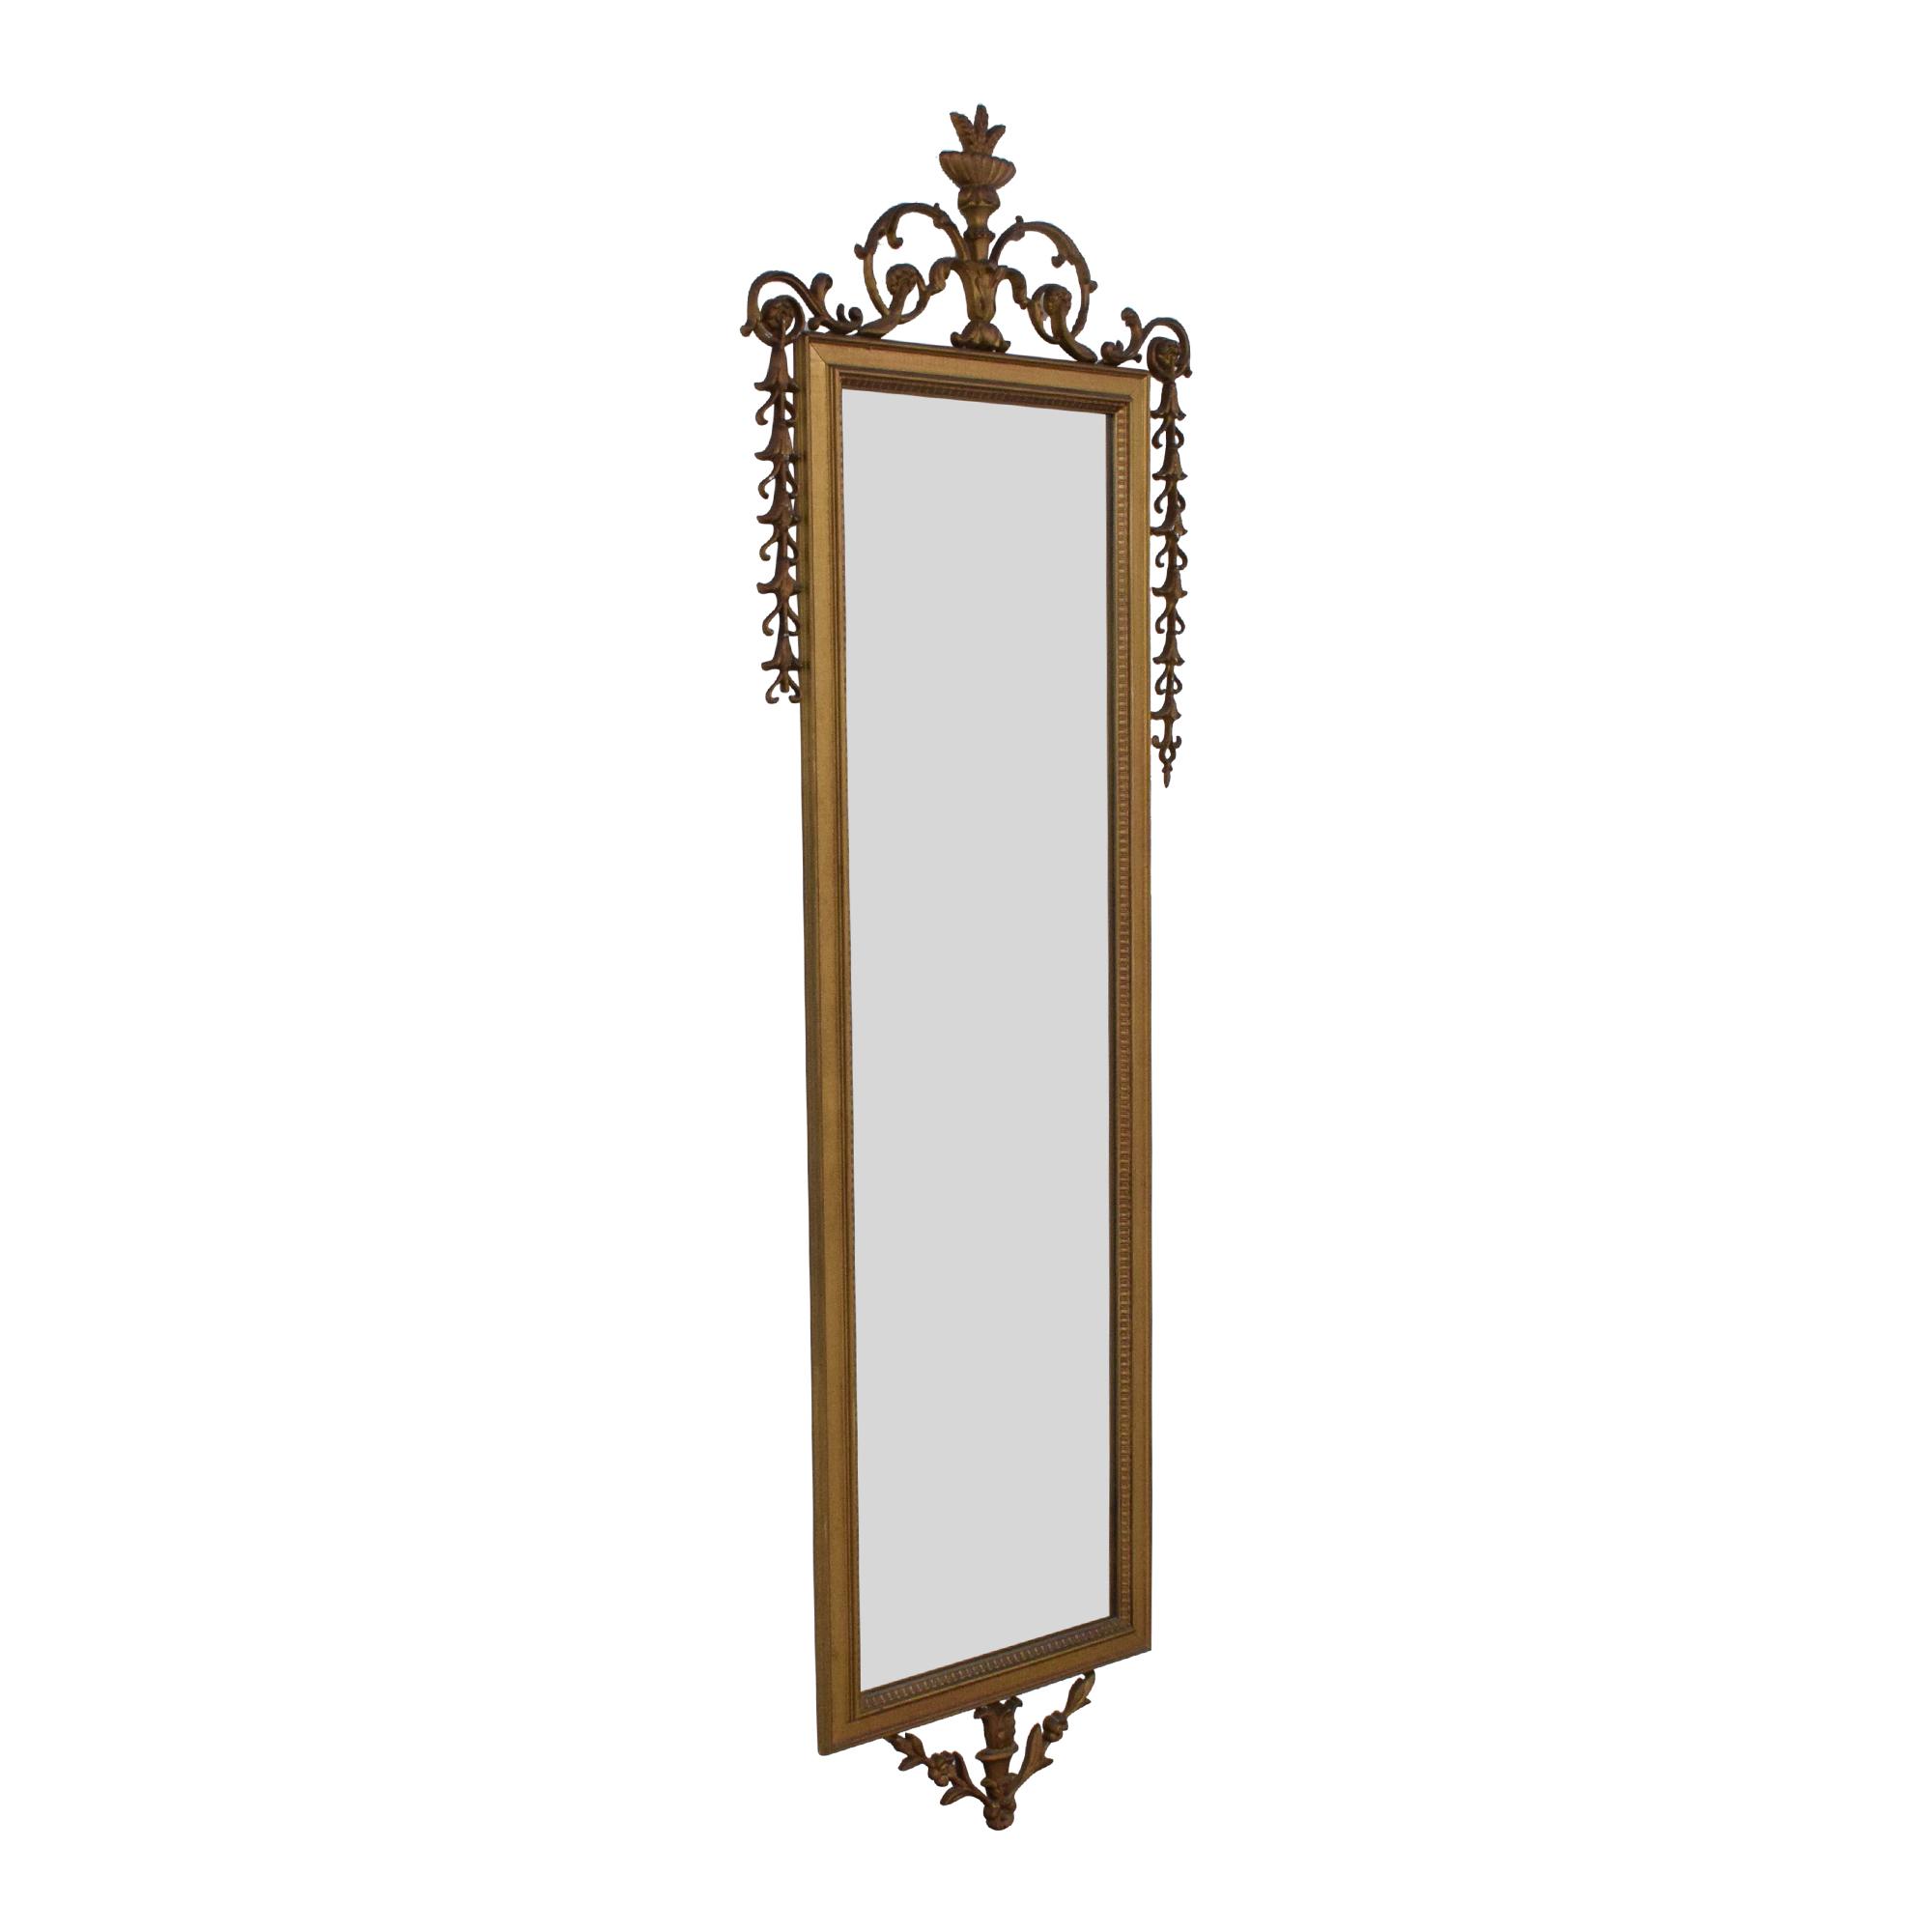 Vintage Style Decorative Mirror